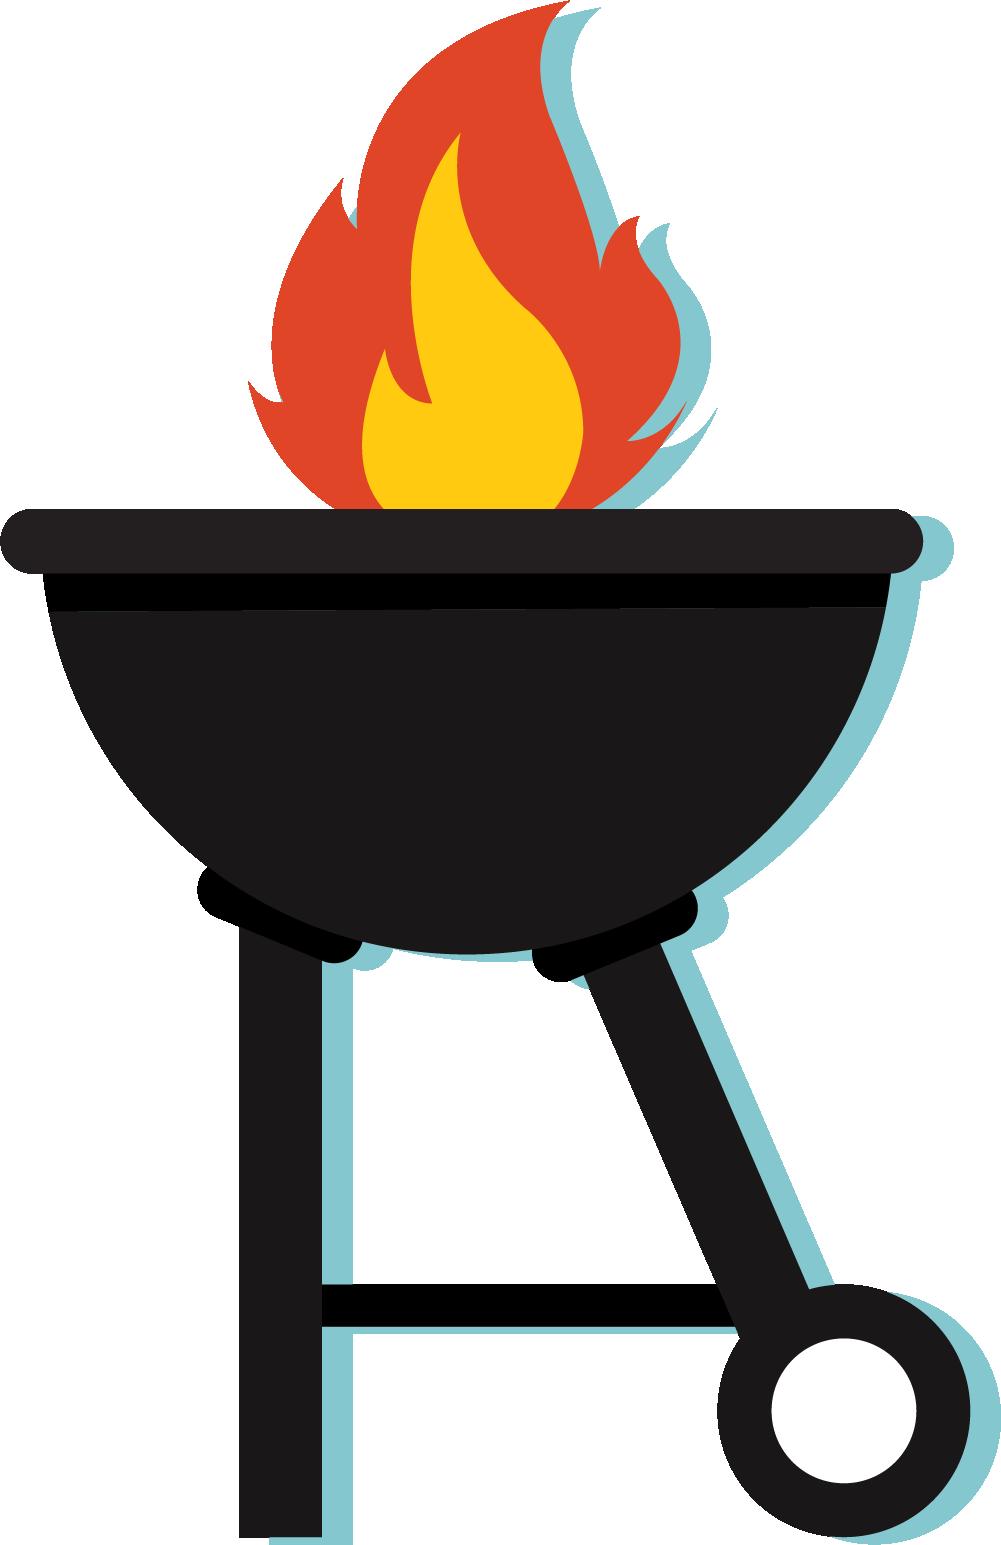 Asado carne asada chuan. Ham clipart barbecue meat